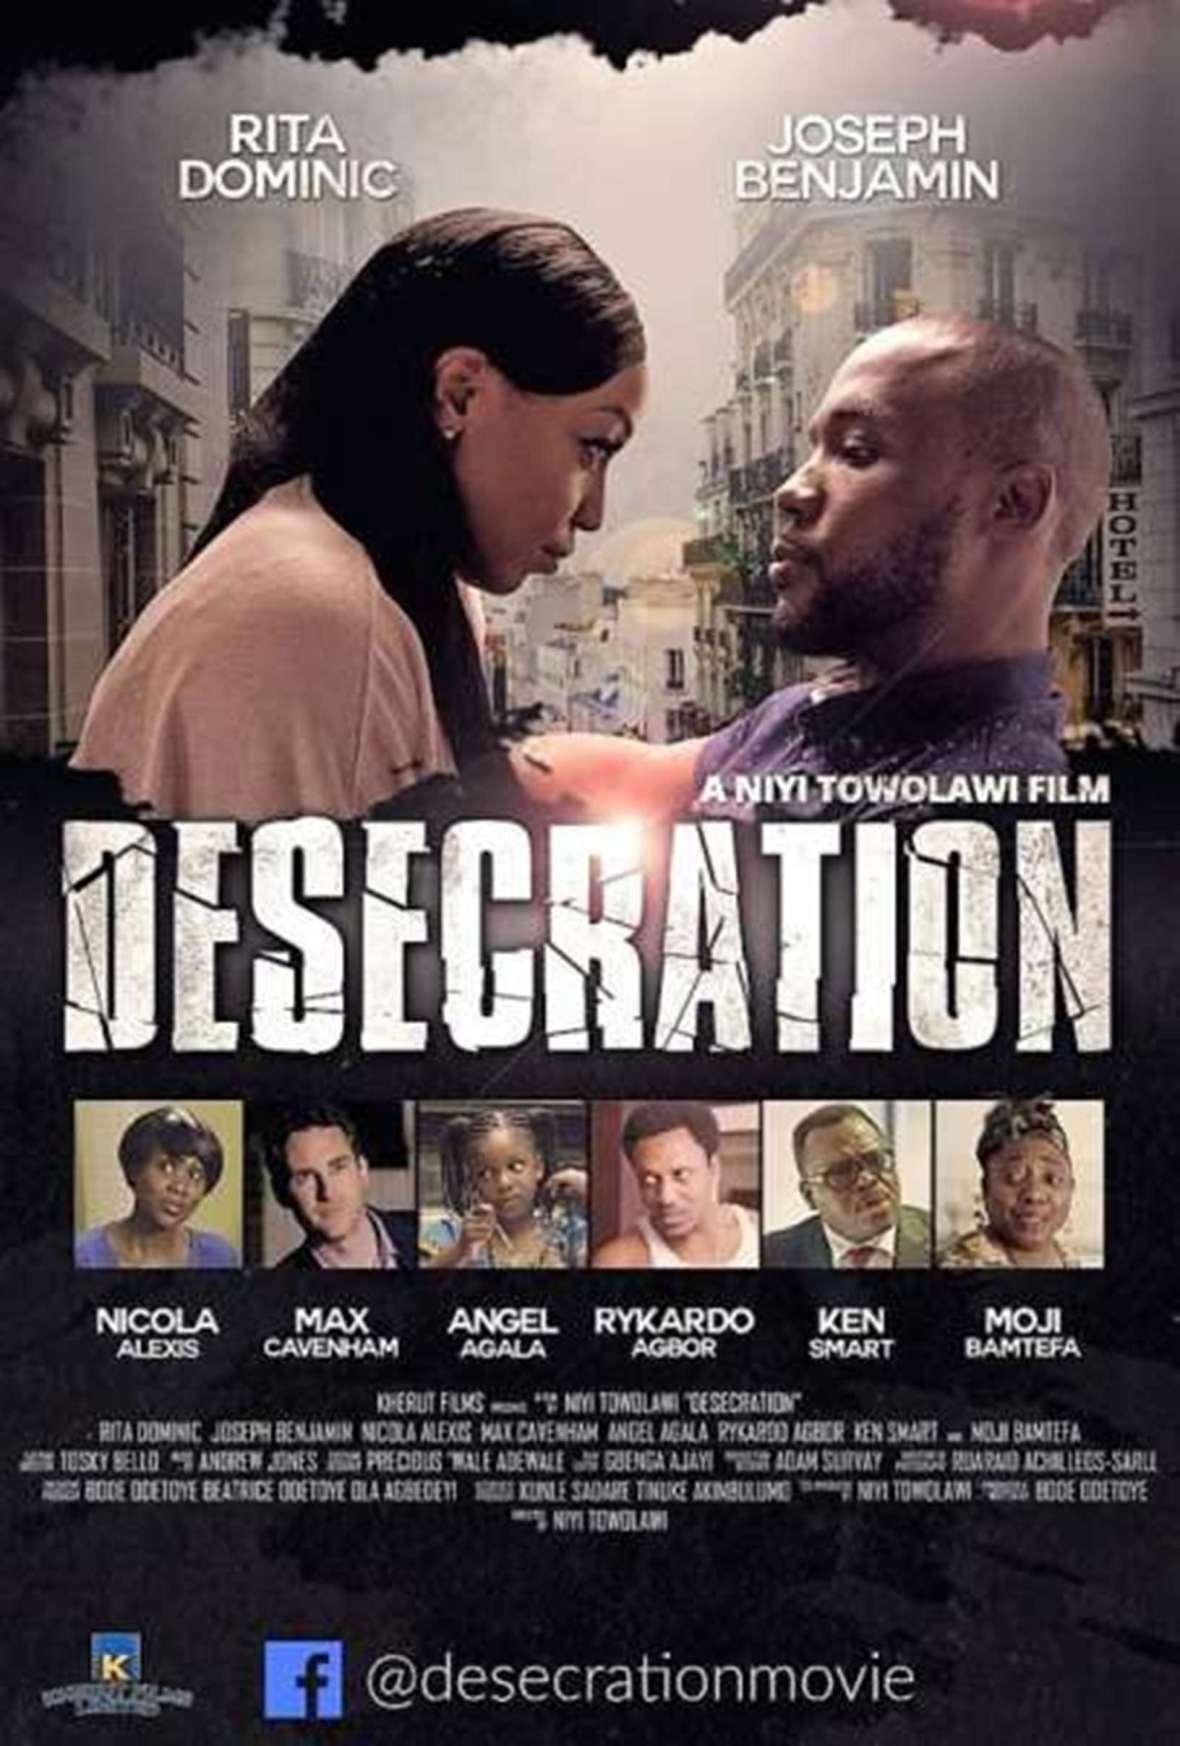 descecration